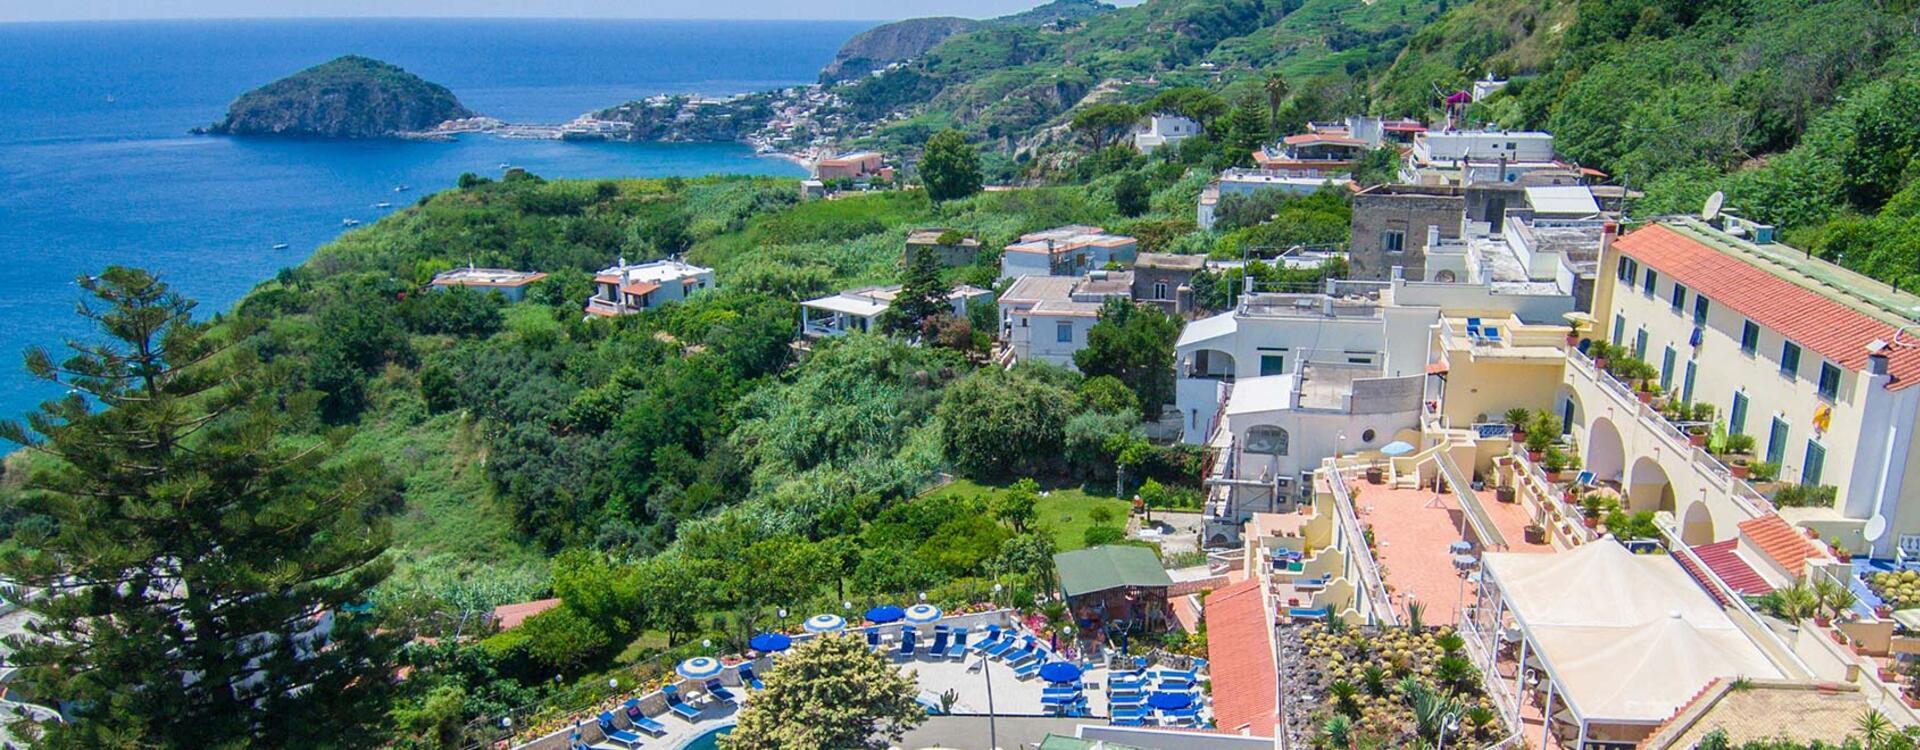 hotelsaintraphaelischia it hotel-ischia-spiaggia-inclusa 009